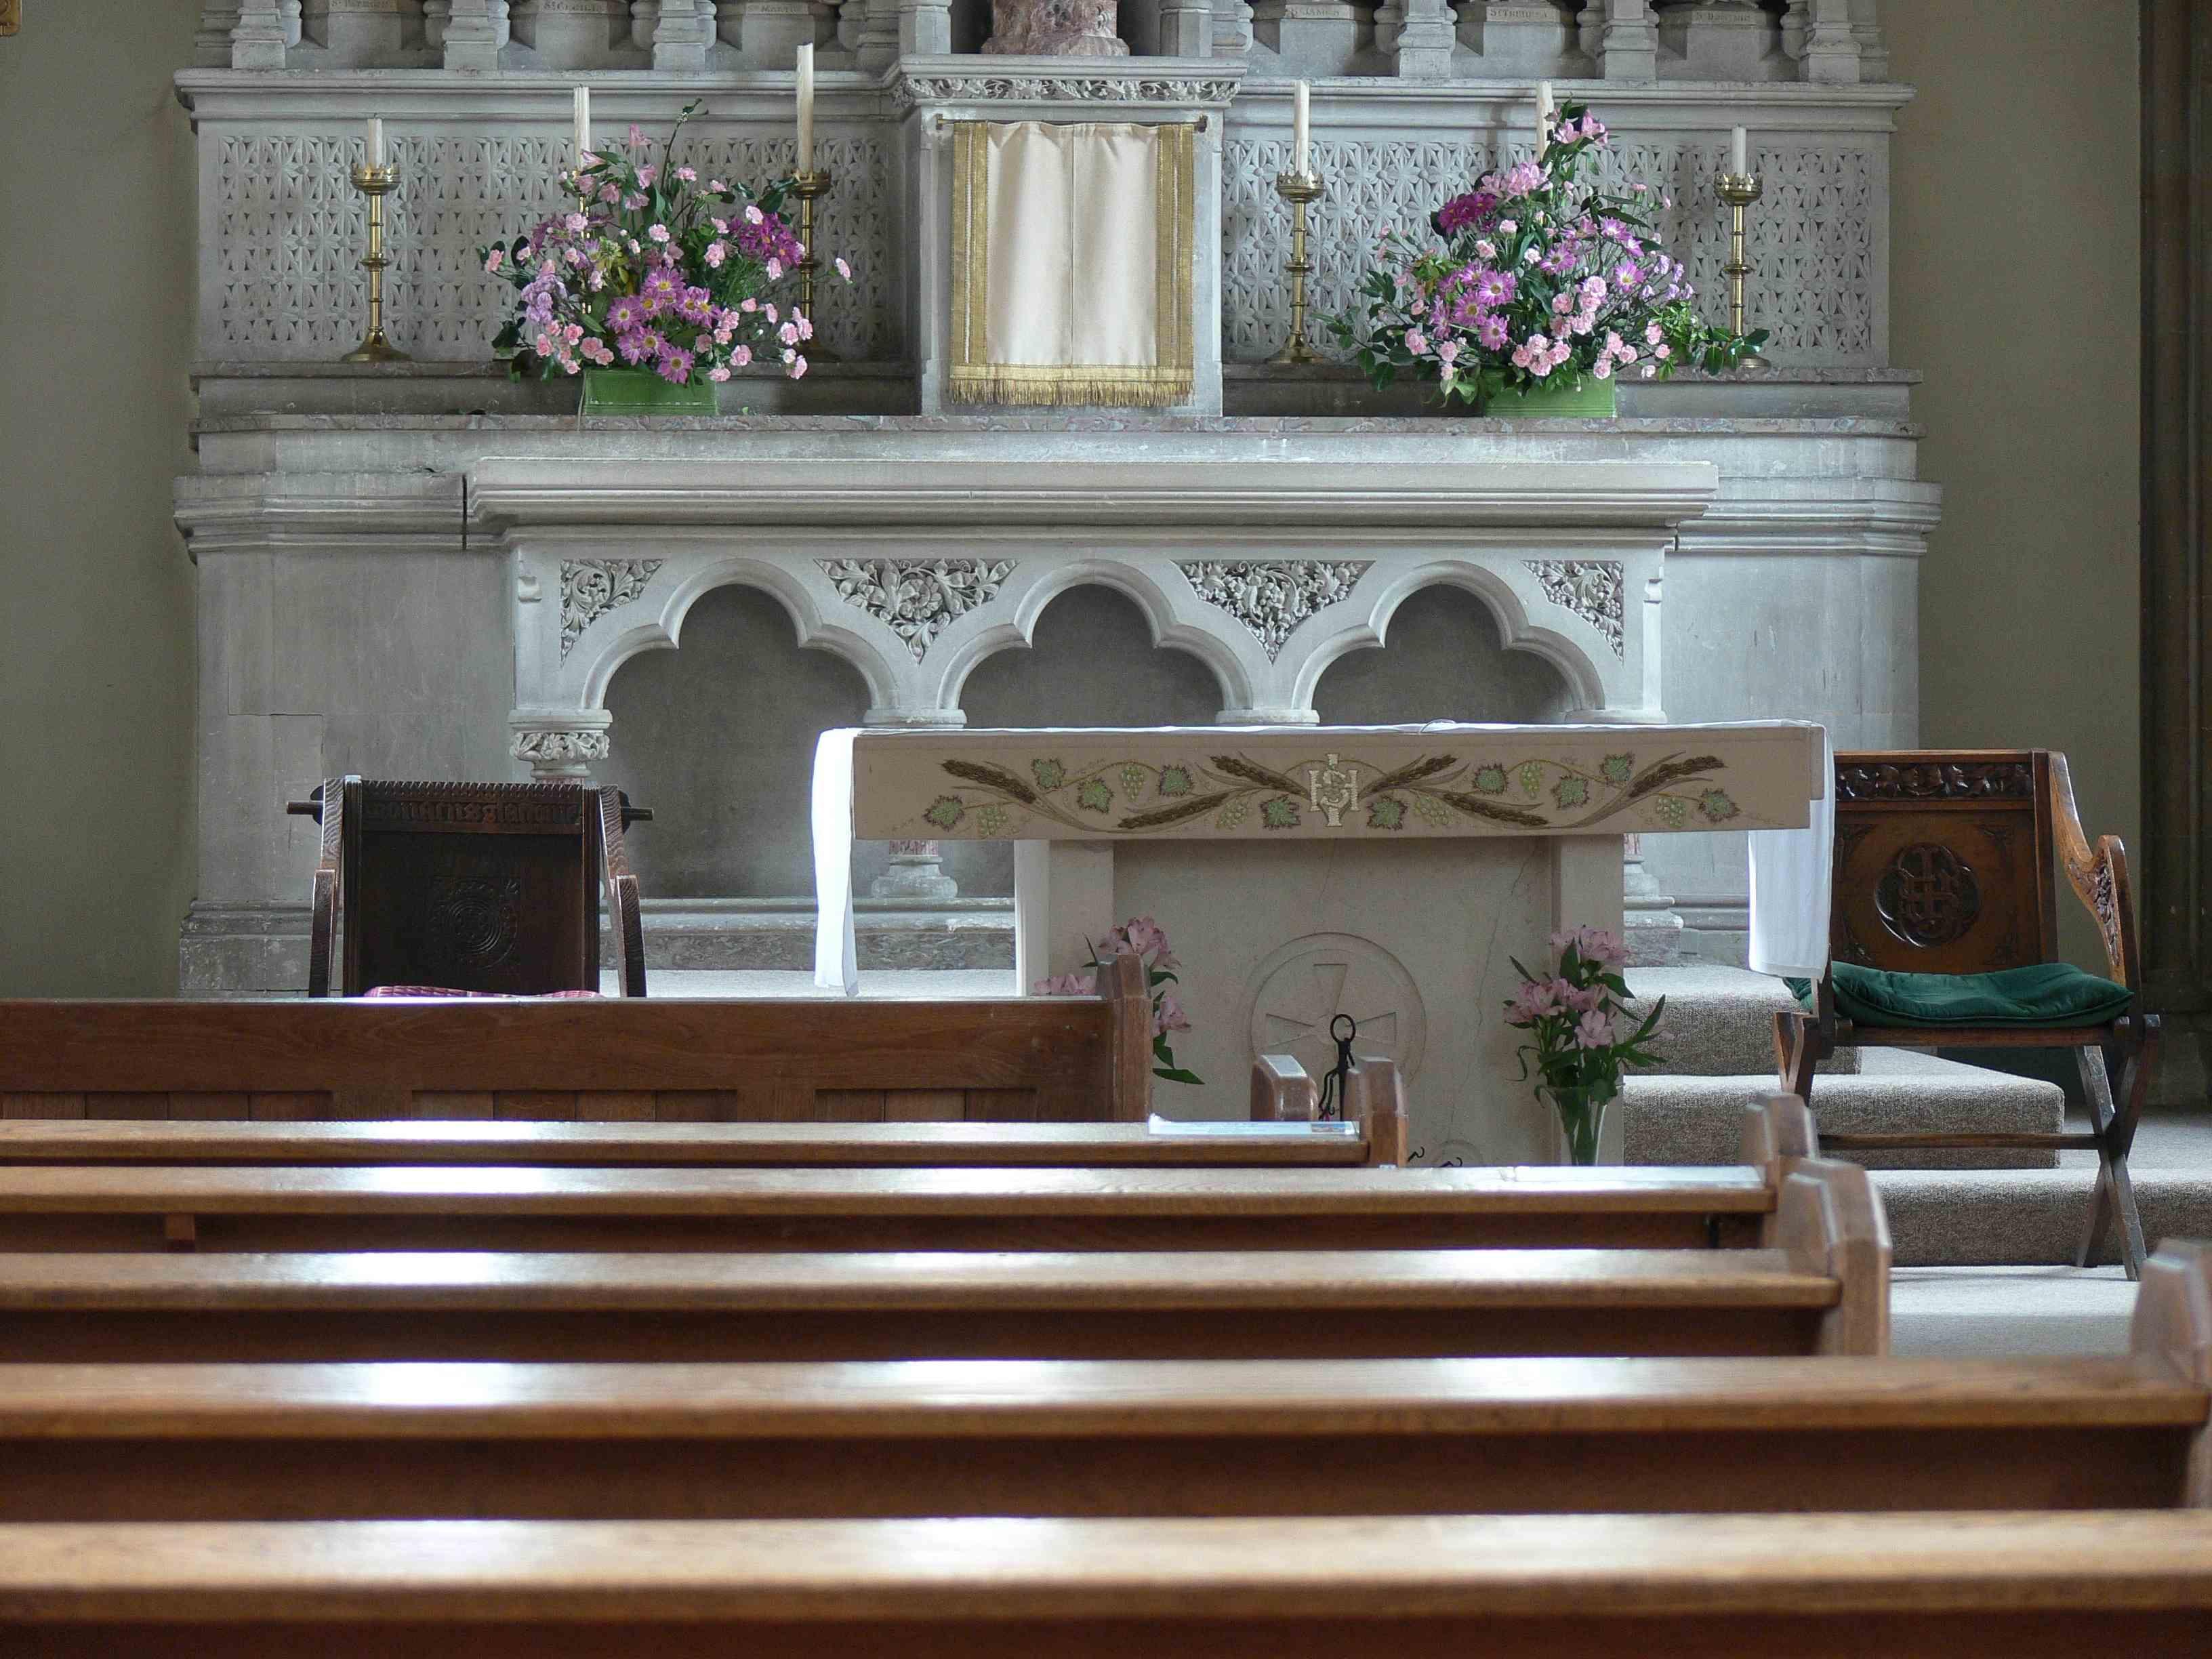 1 St Peter's Church 136